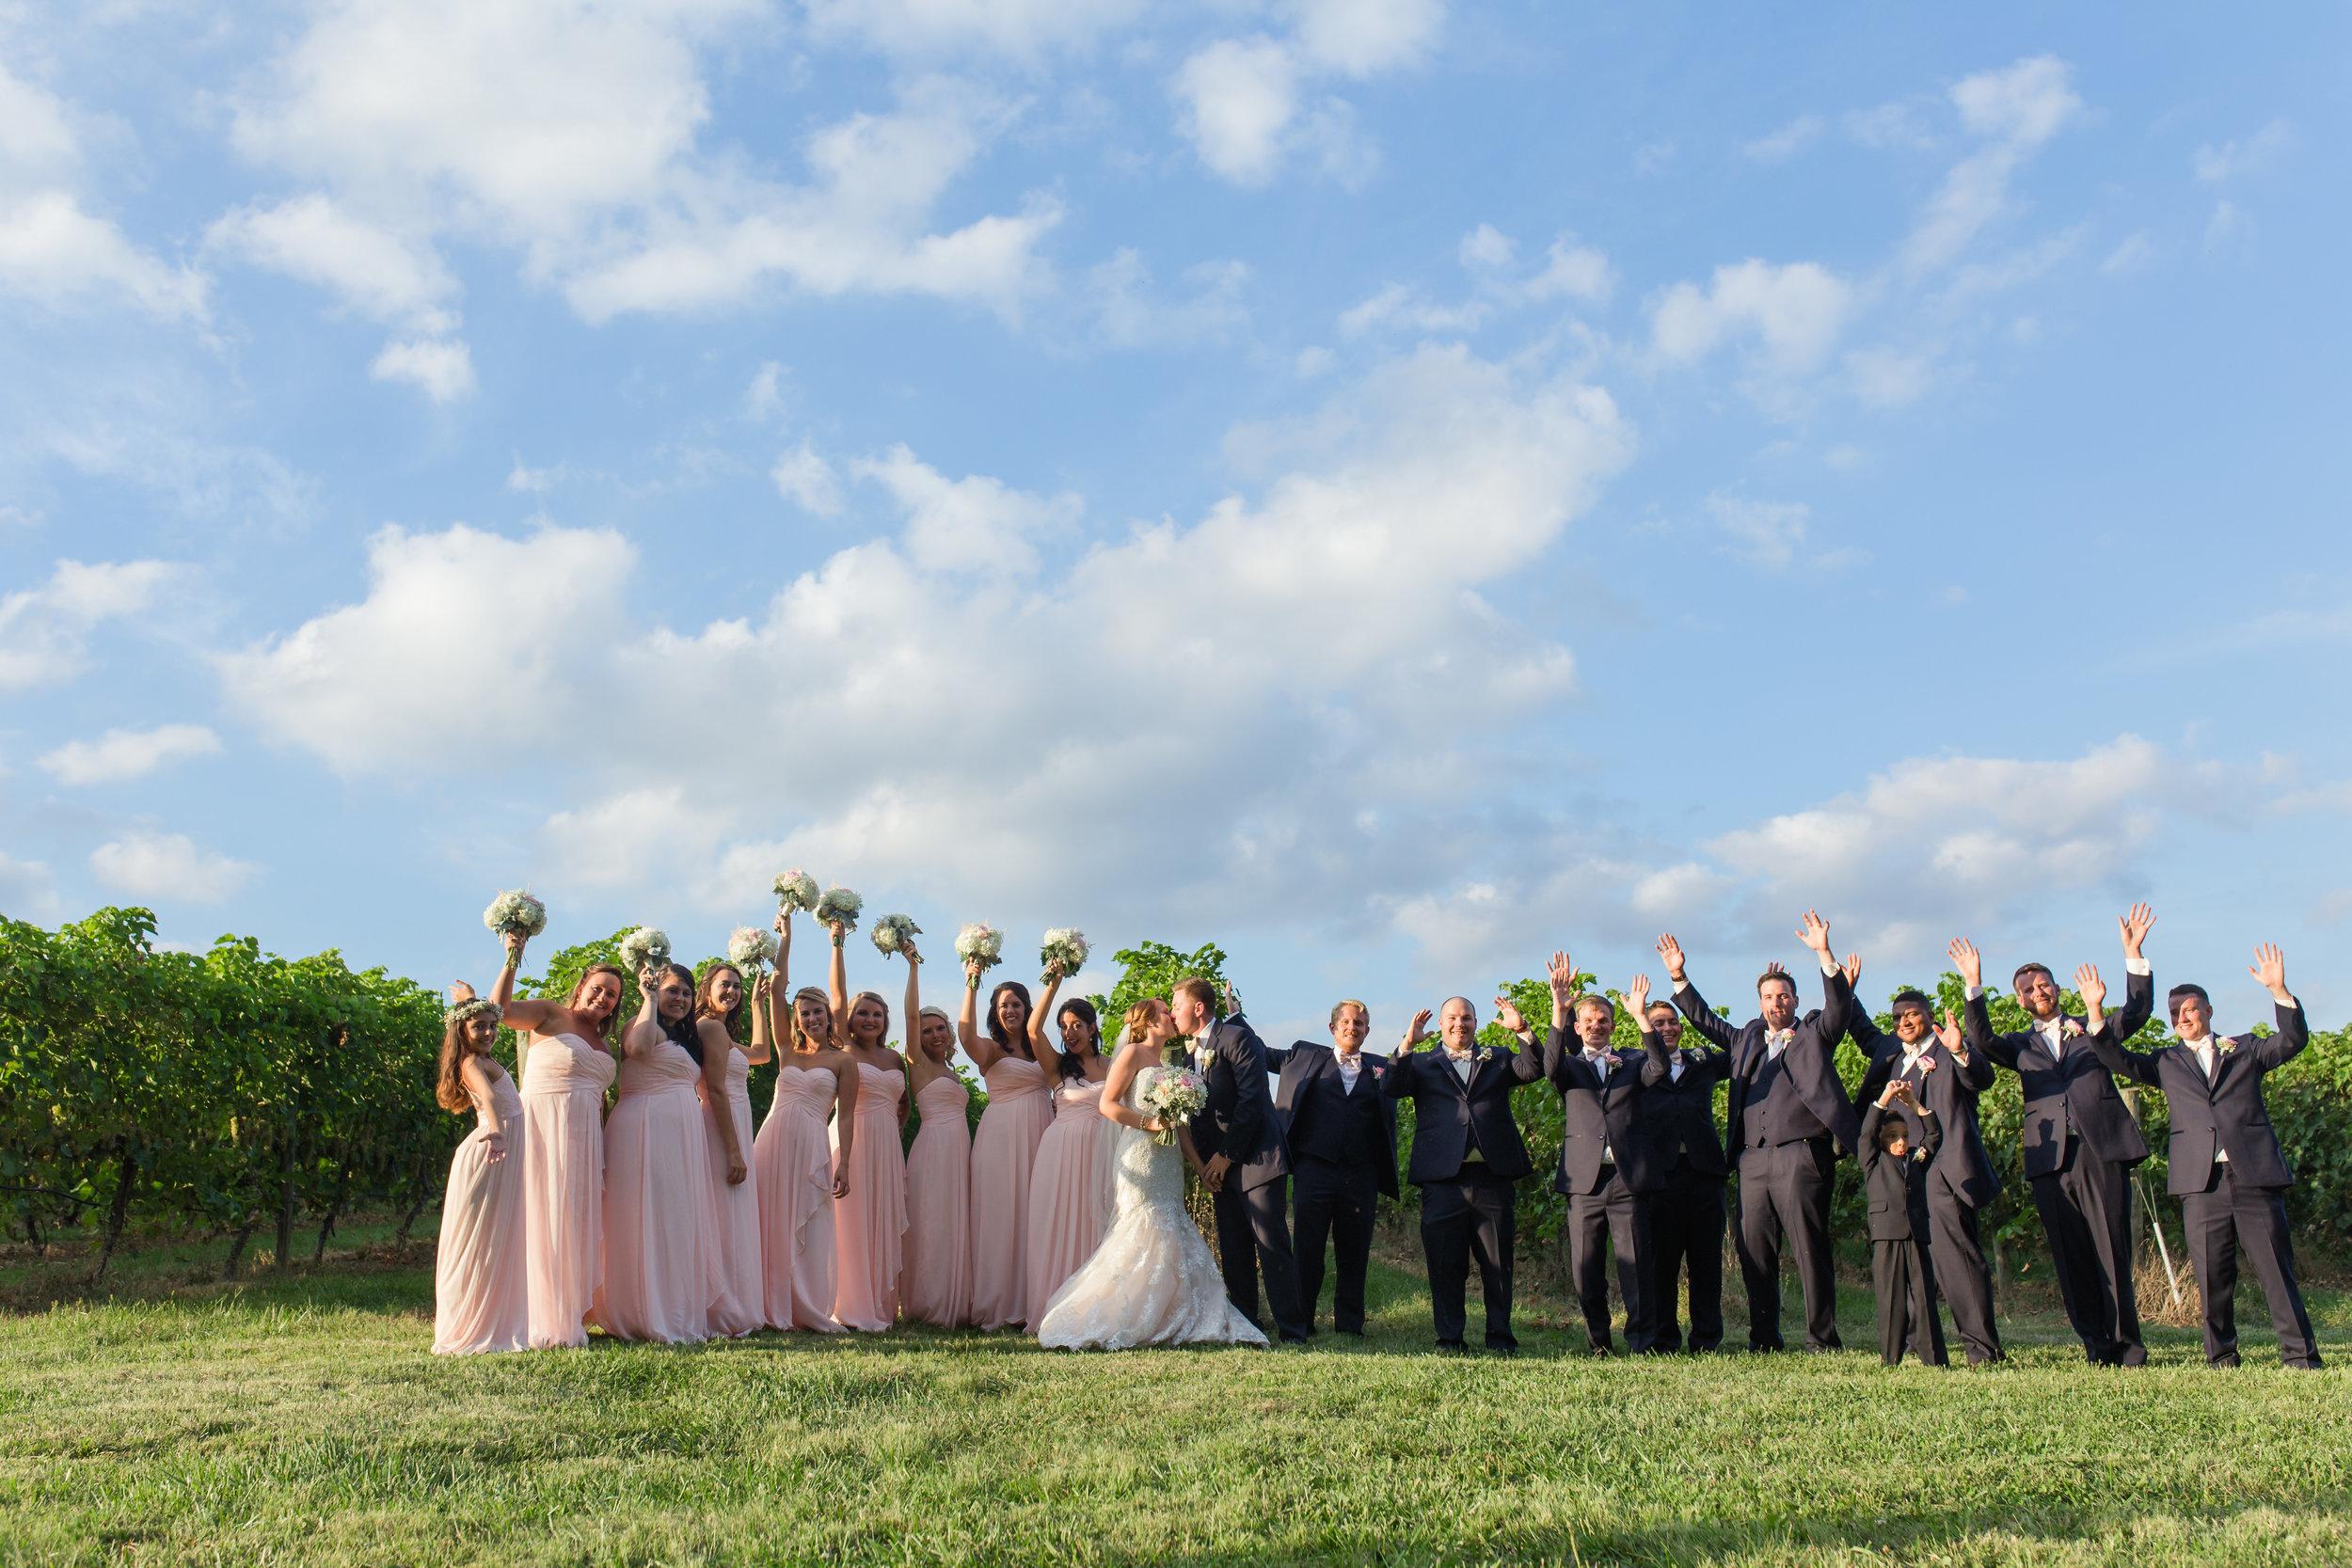 wedding party19.jpg